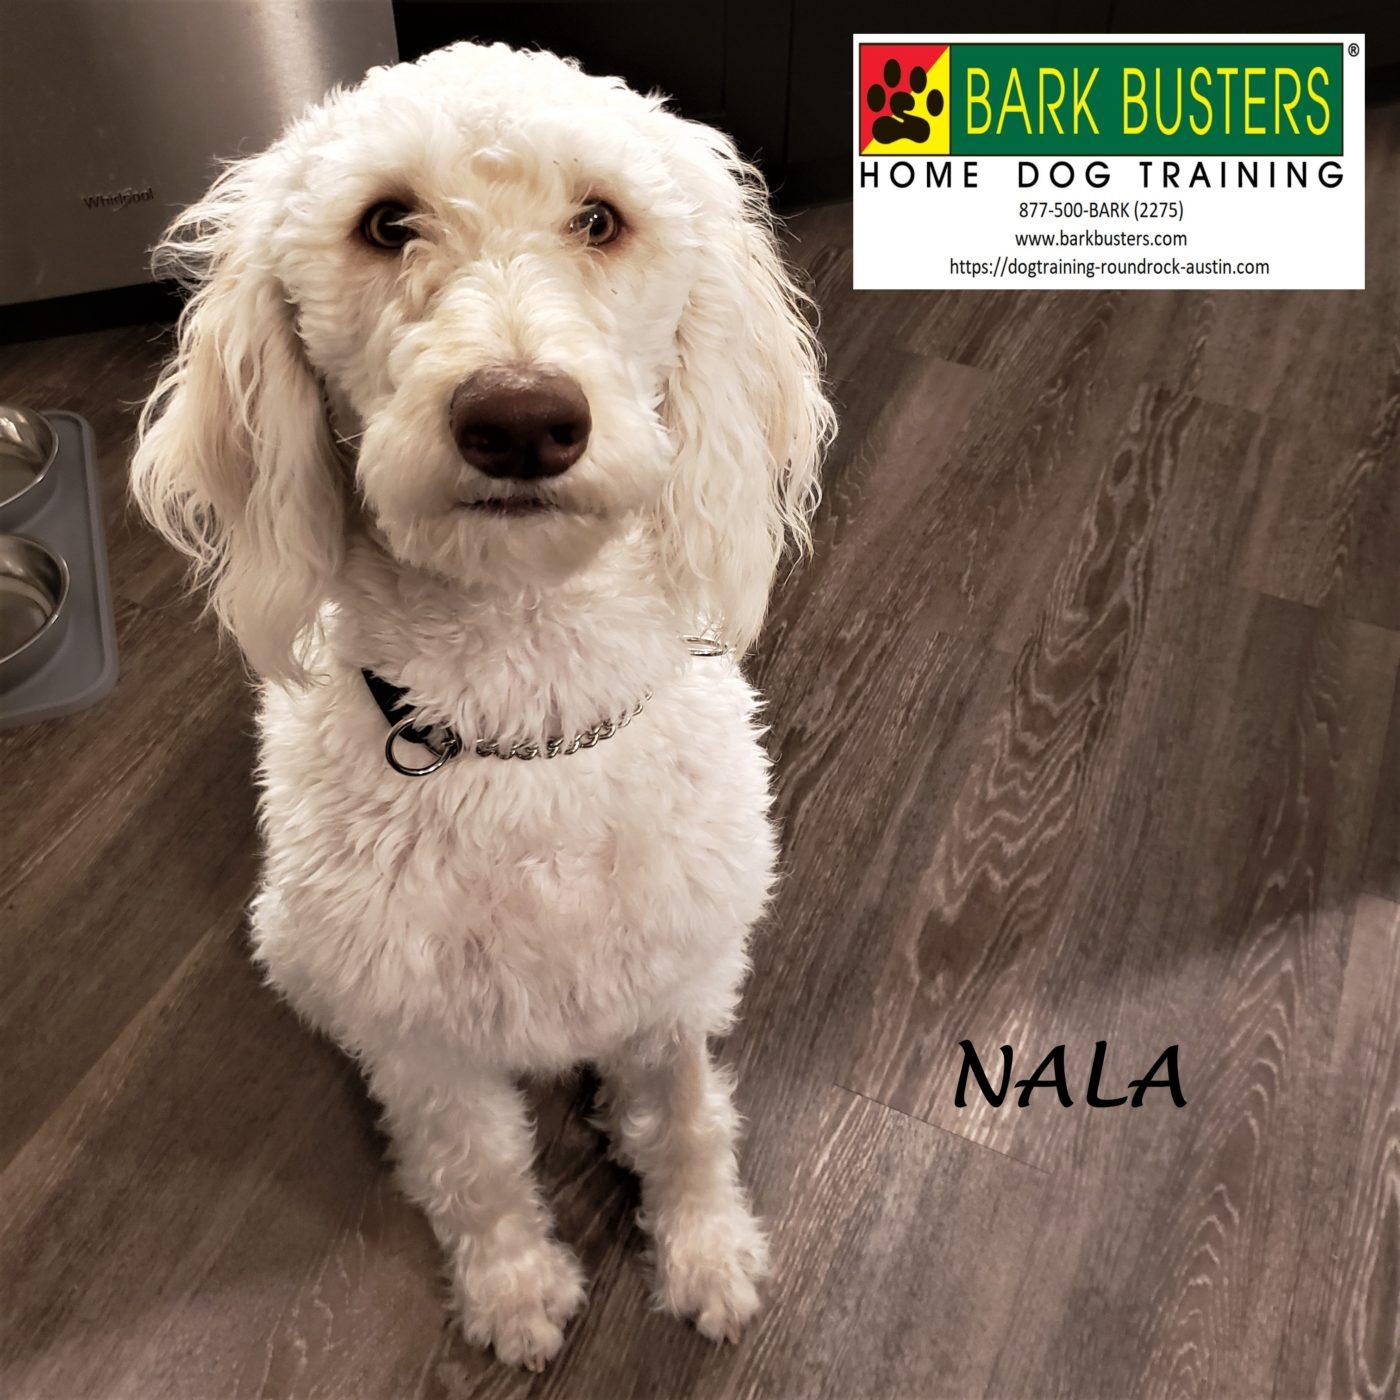 #doubledoodle #leashmanners #obediencetraining #dogsofbarkbusters #barkbusters #dogtrainingaustin #atx #speakdog #inhomedogtraining